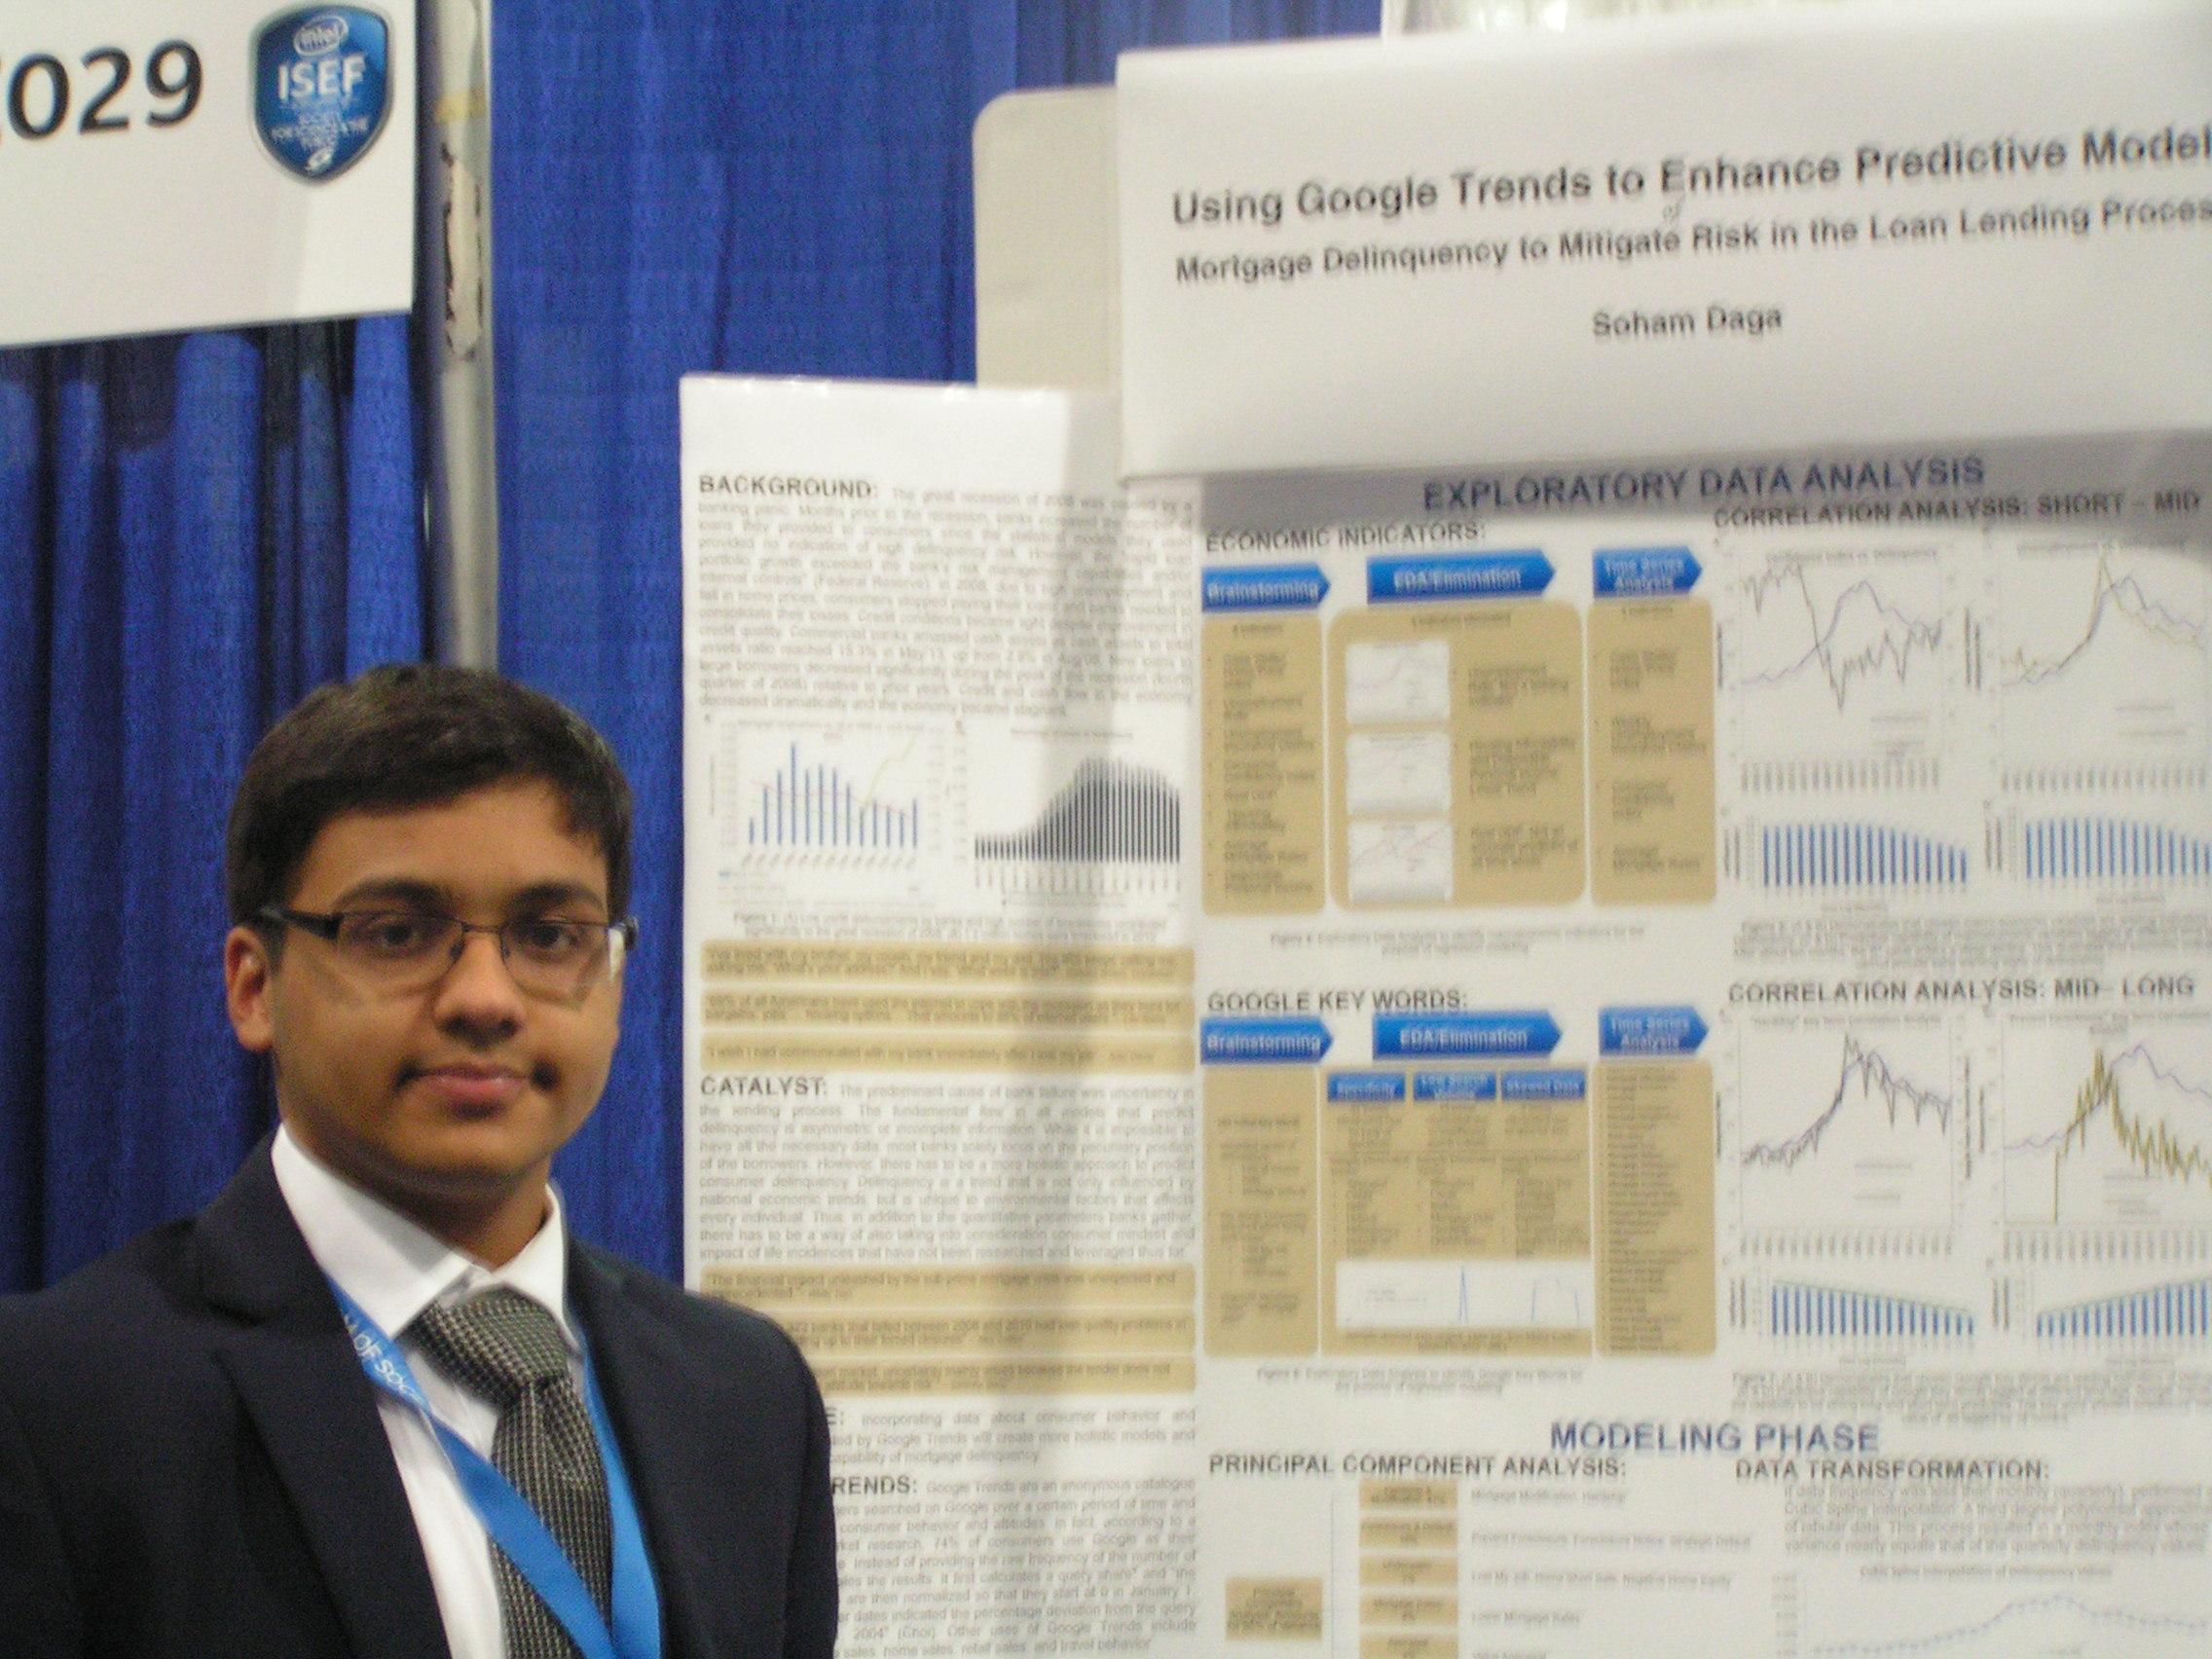 Intel Science Fair >> Statistics And R At The Intel Isef Science Fair Revolutions